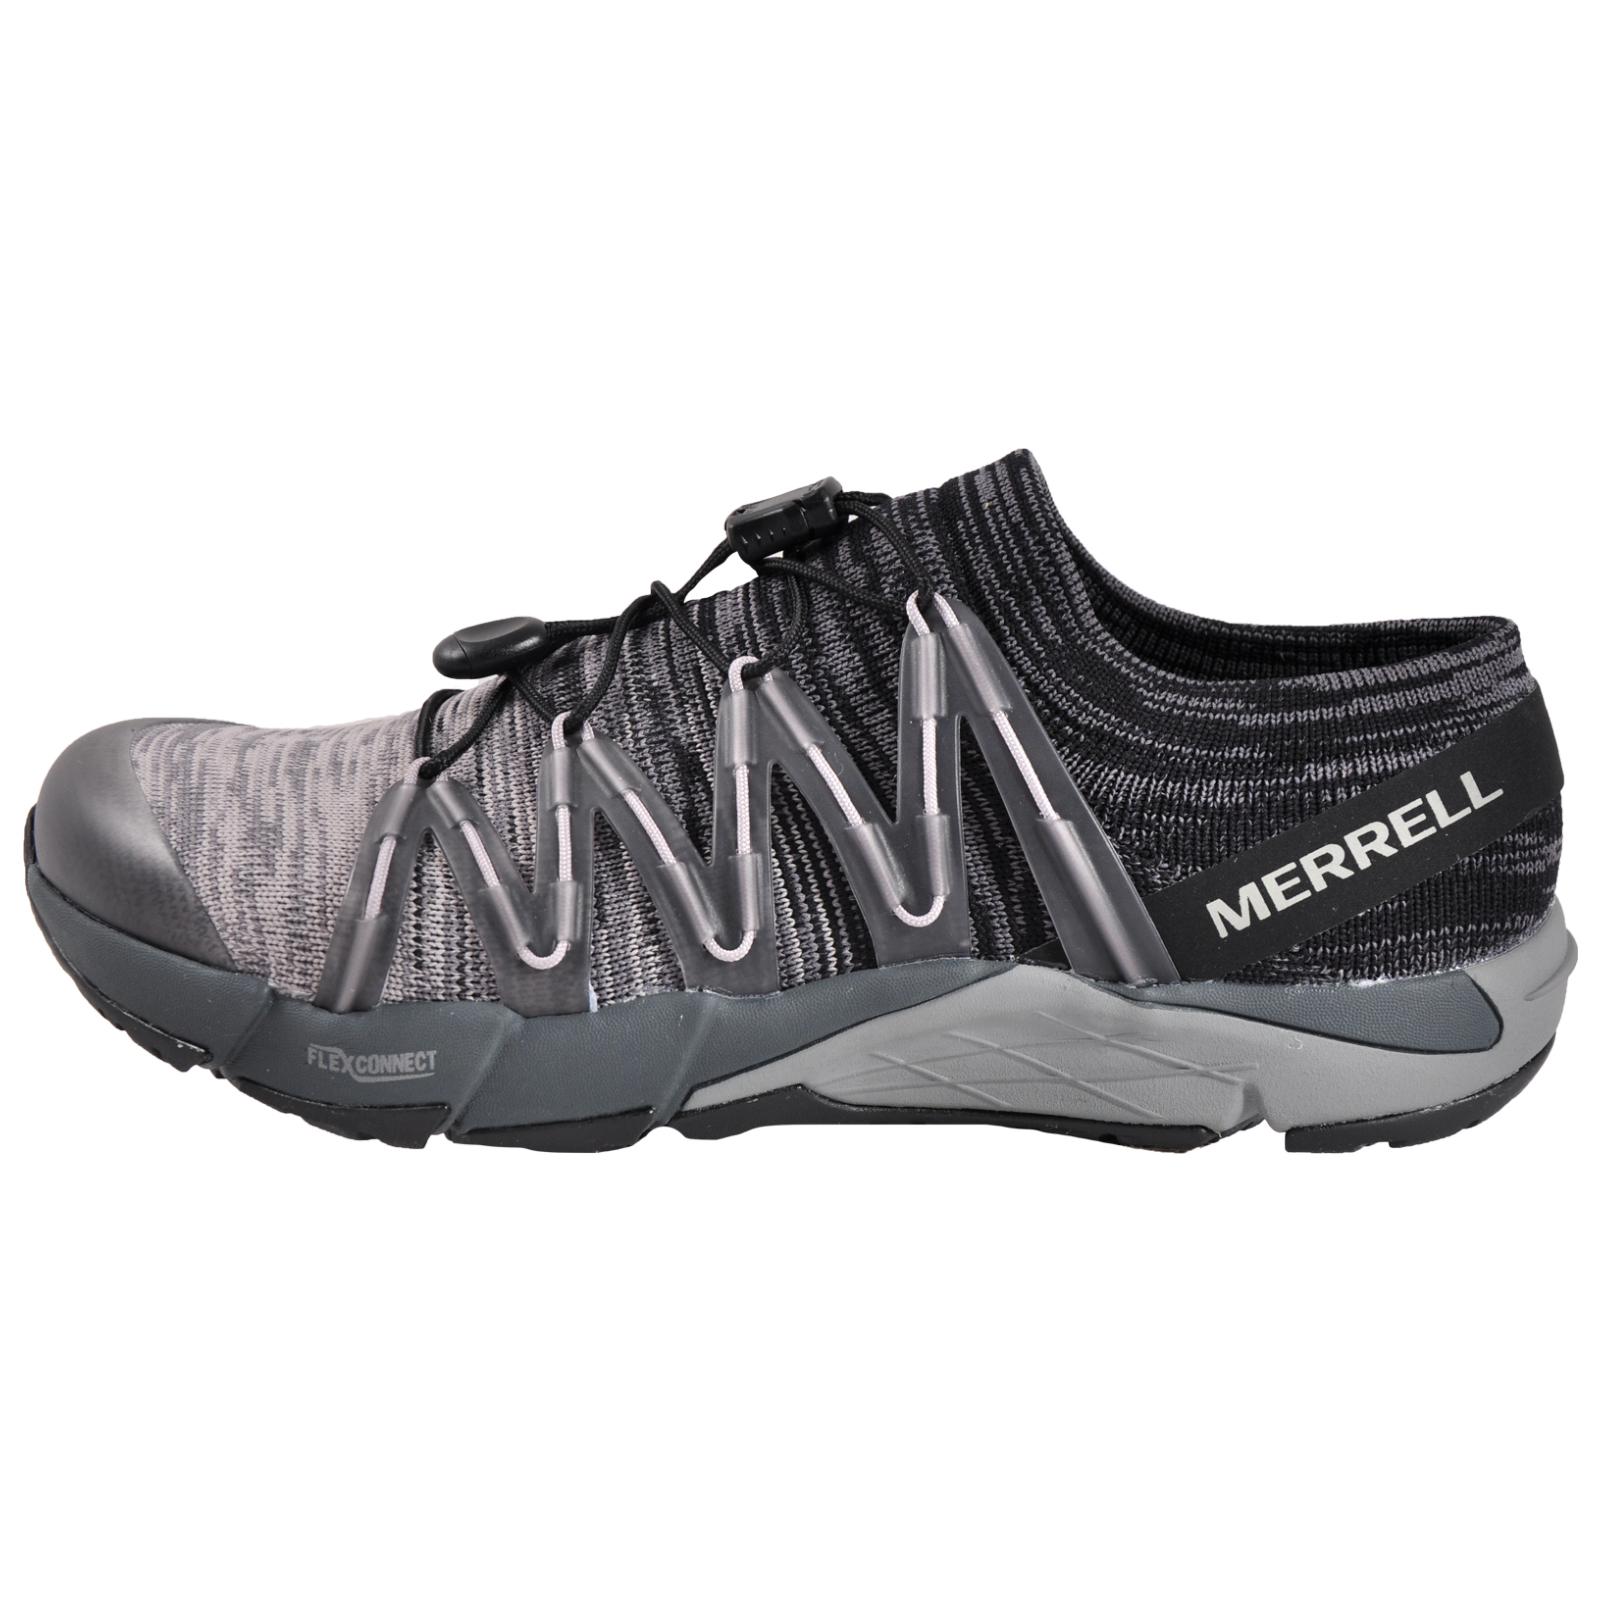 Merrell Femme Bare Access Flex Trail Chaussures De Course Baskets Baskets Rose